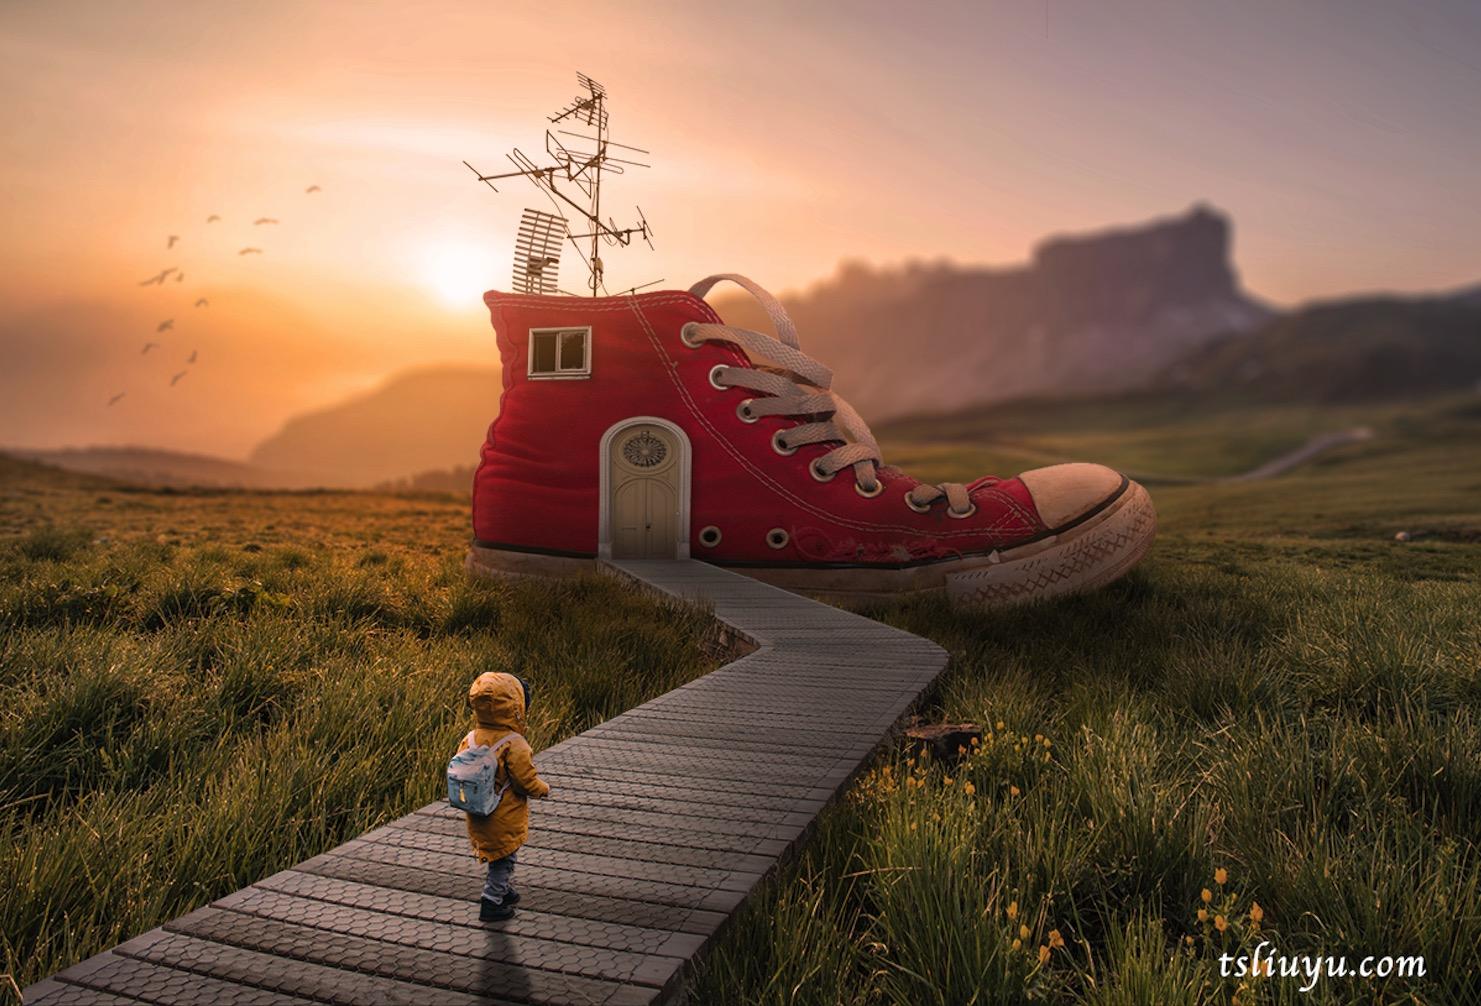 PS合成练习 模仿rafy-a图片视觉合成案例 鞋子小屋(素材&视频&PSD) 修图练习 第1张